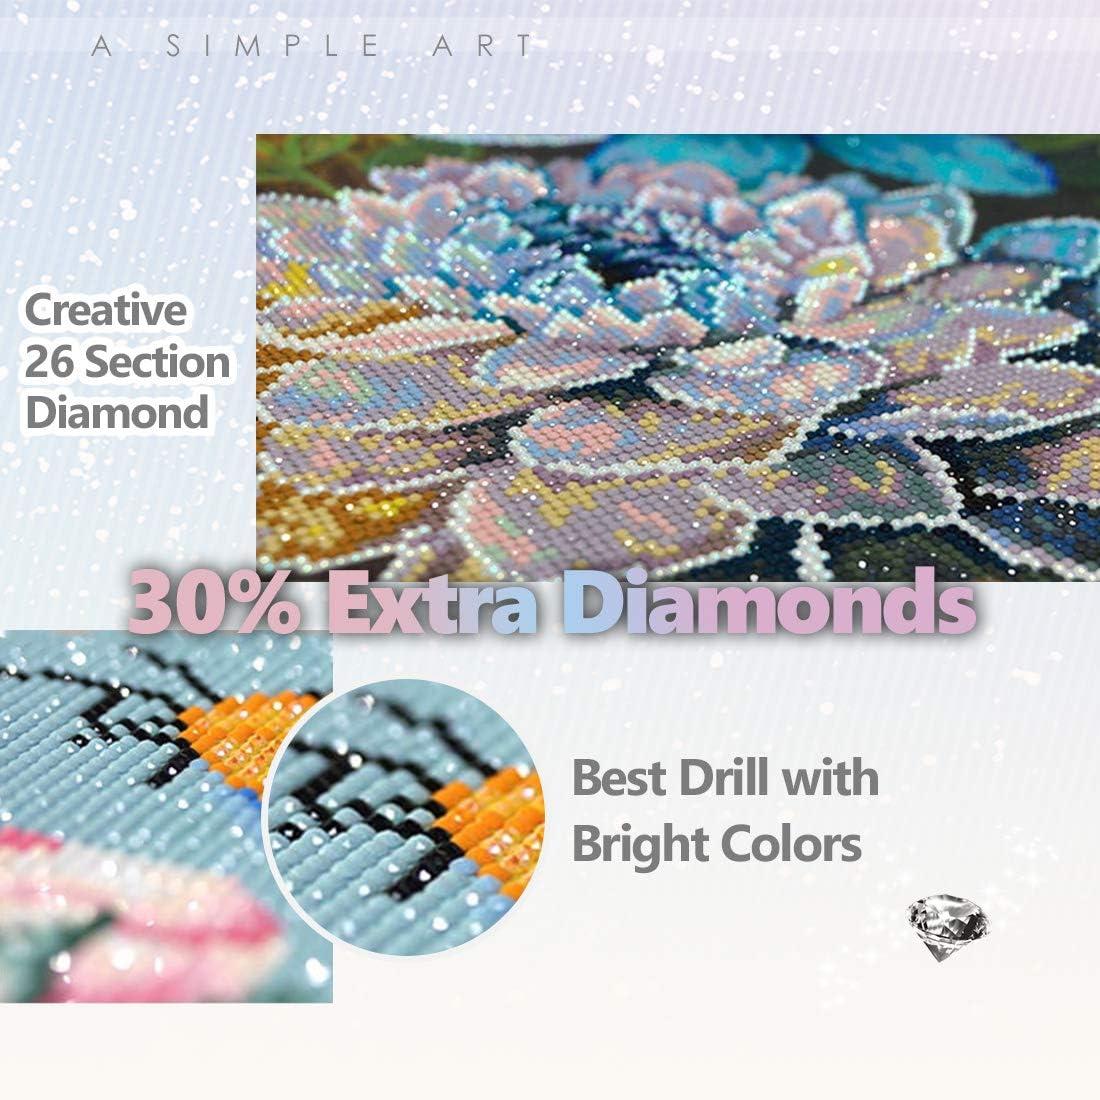 Maysurban DIY Pintura Diamante 5D Kits de Diamante DIY Pintura Diamante Bordado Completo 5D Diamond Painting Completo Full Flor amarilla 40x30cm